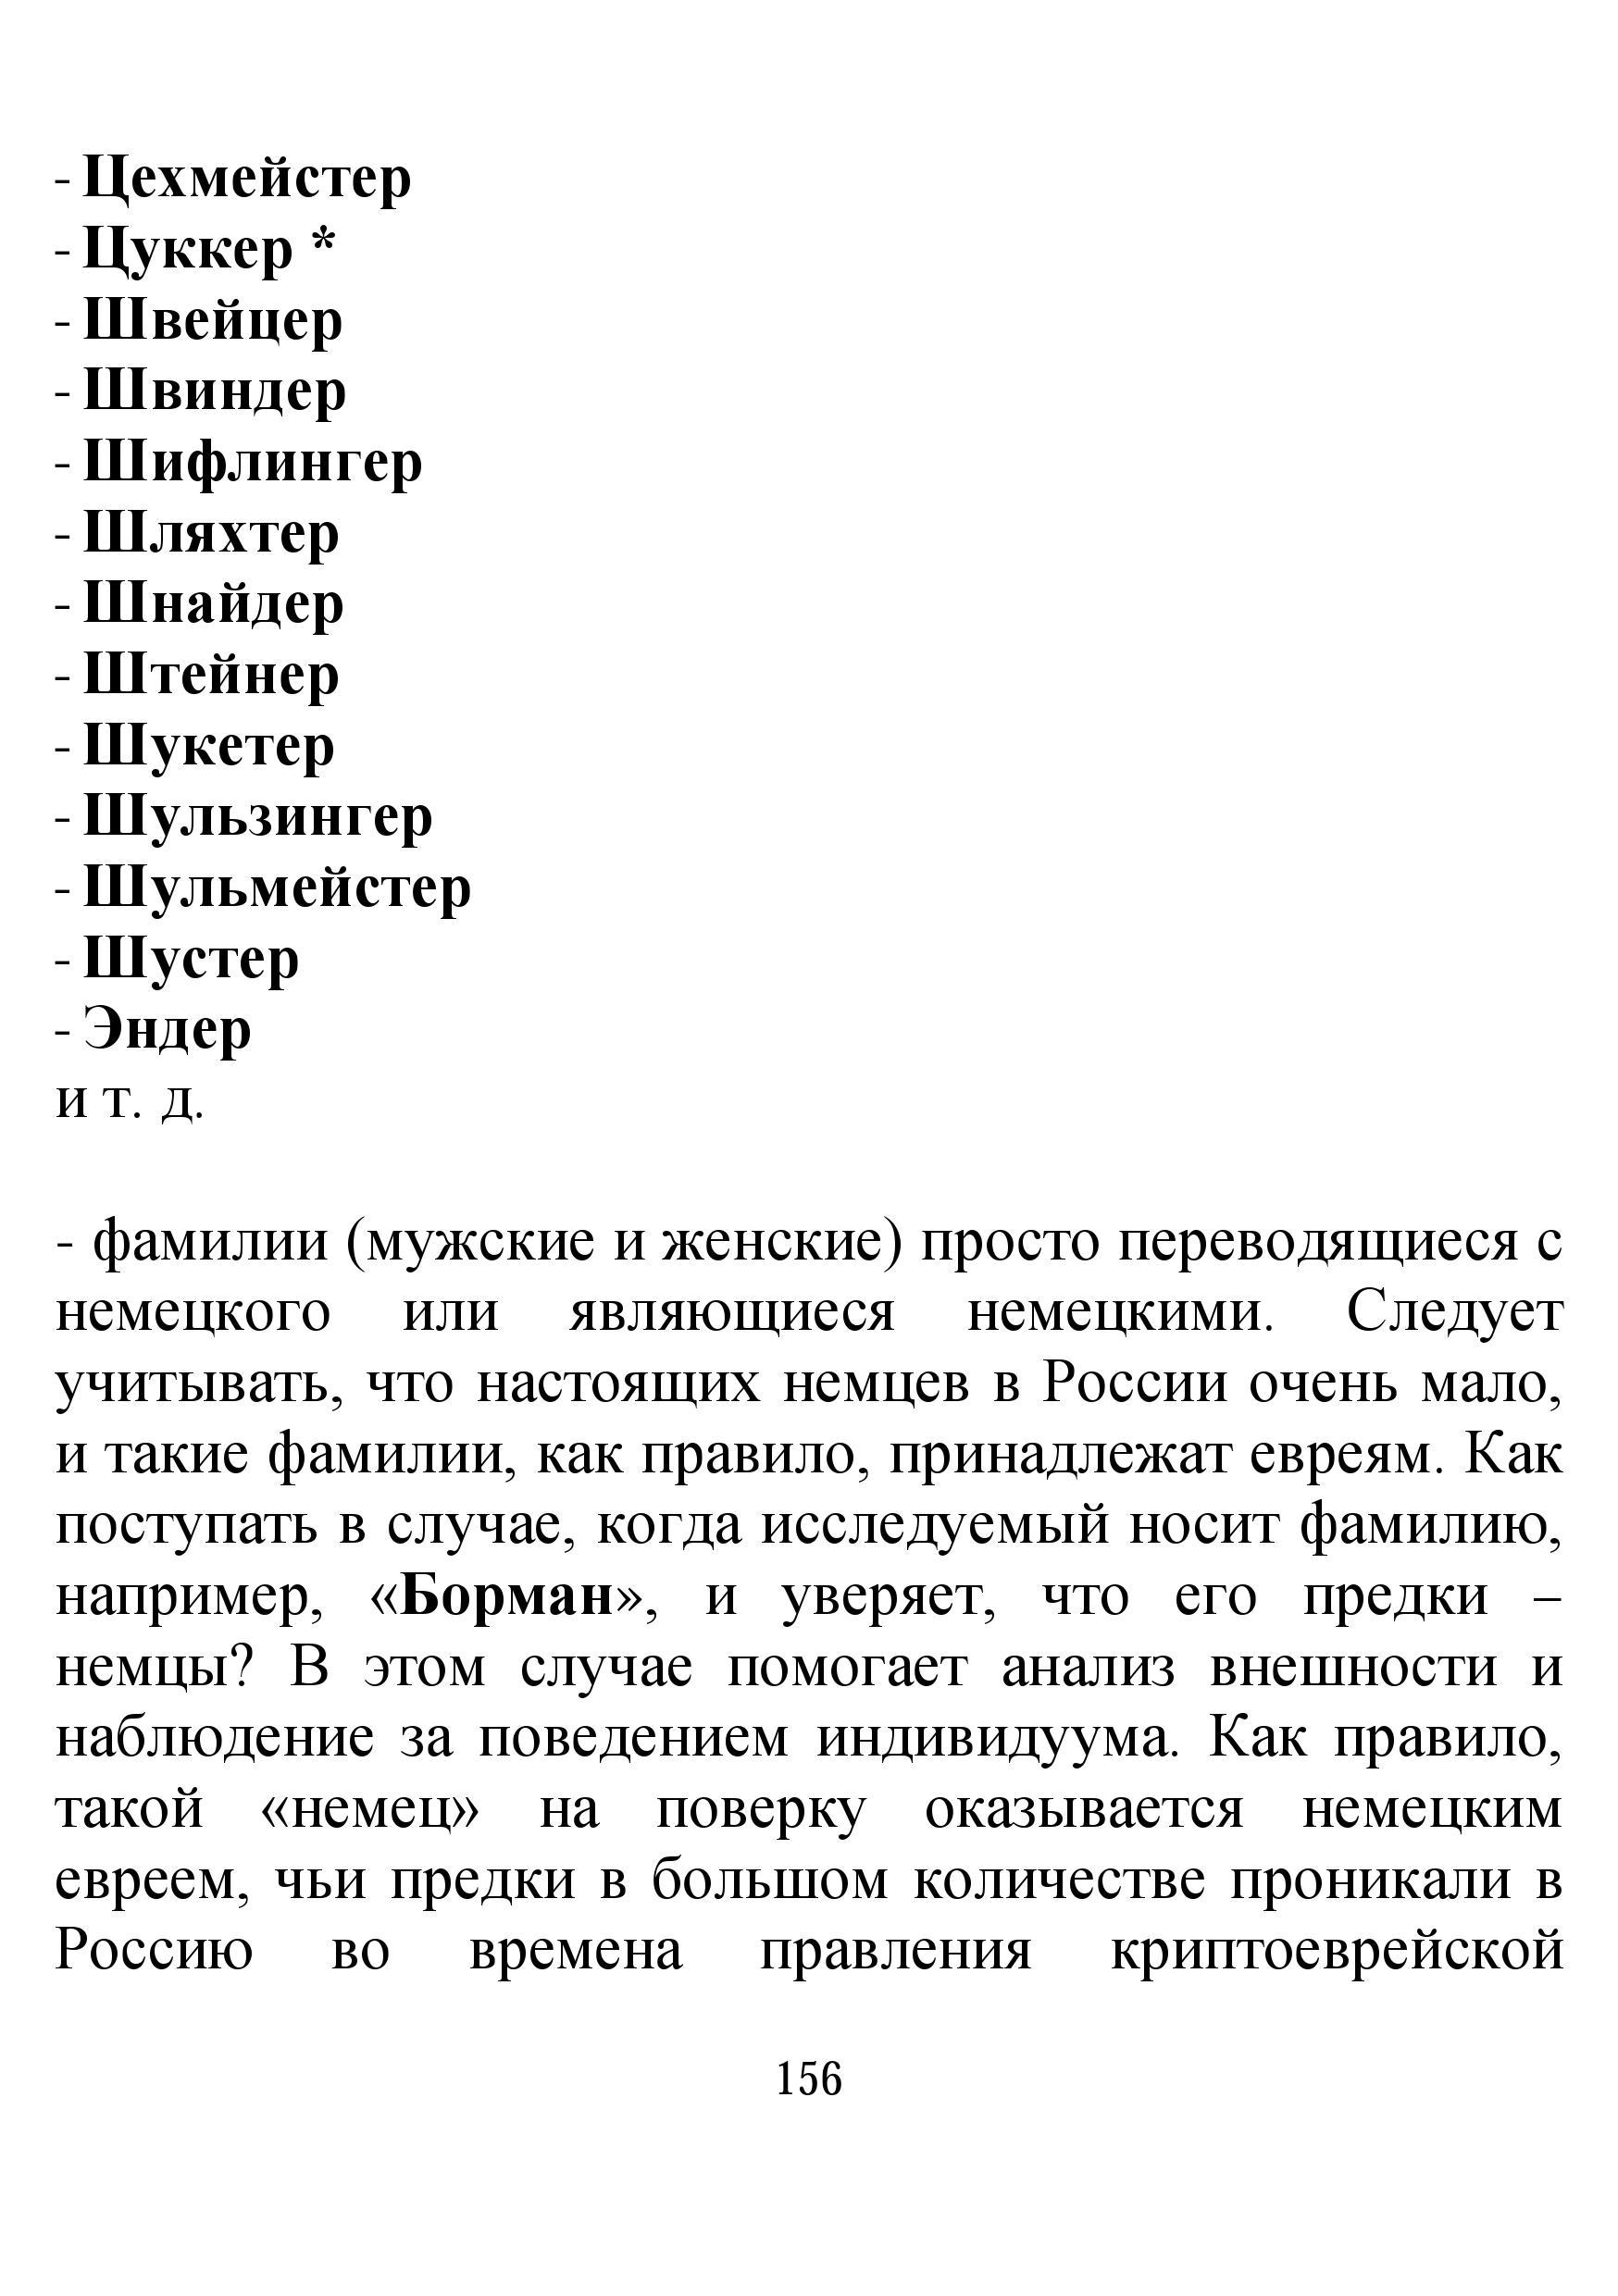 http://s4.uploads.ru/mb7EA.jpg